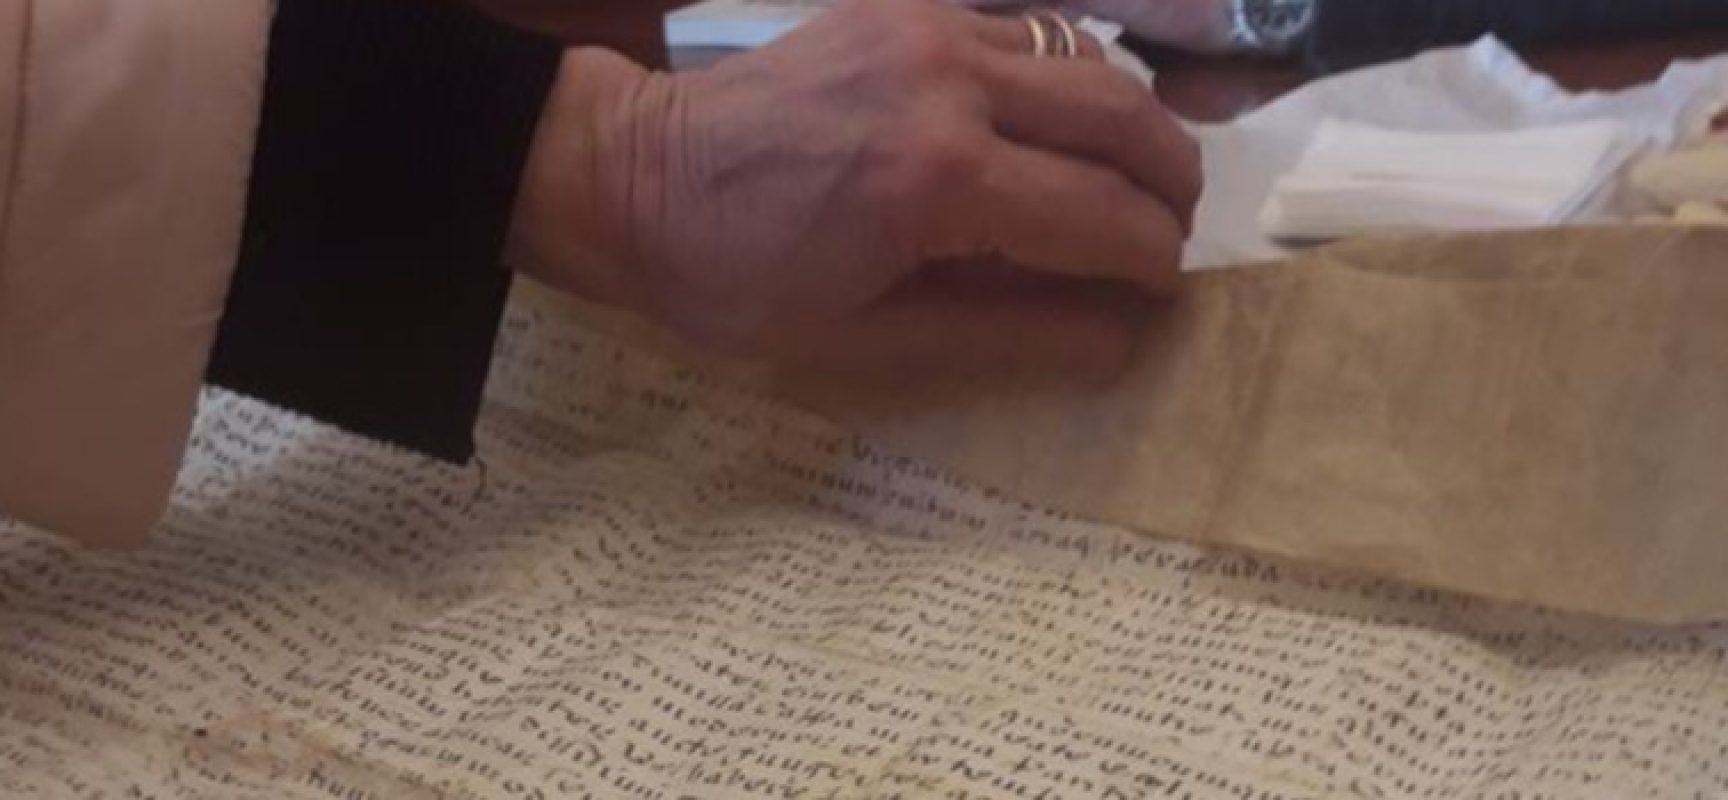 Ritrovata a Parigi pergamena del 1741 trafugata da Bisceglie